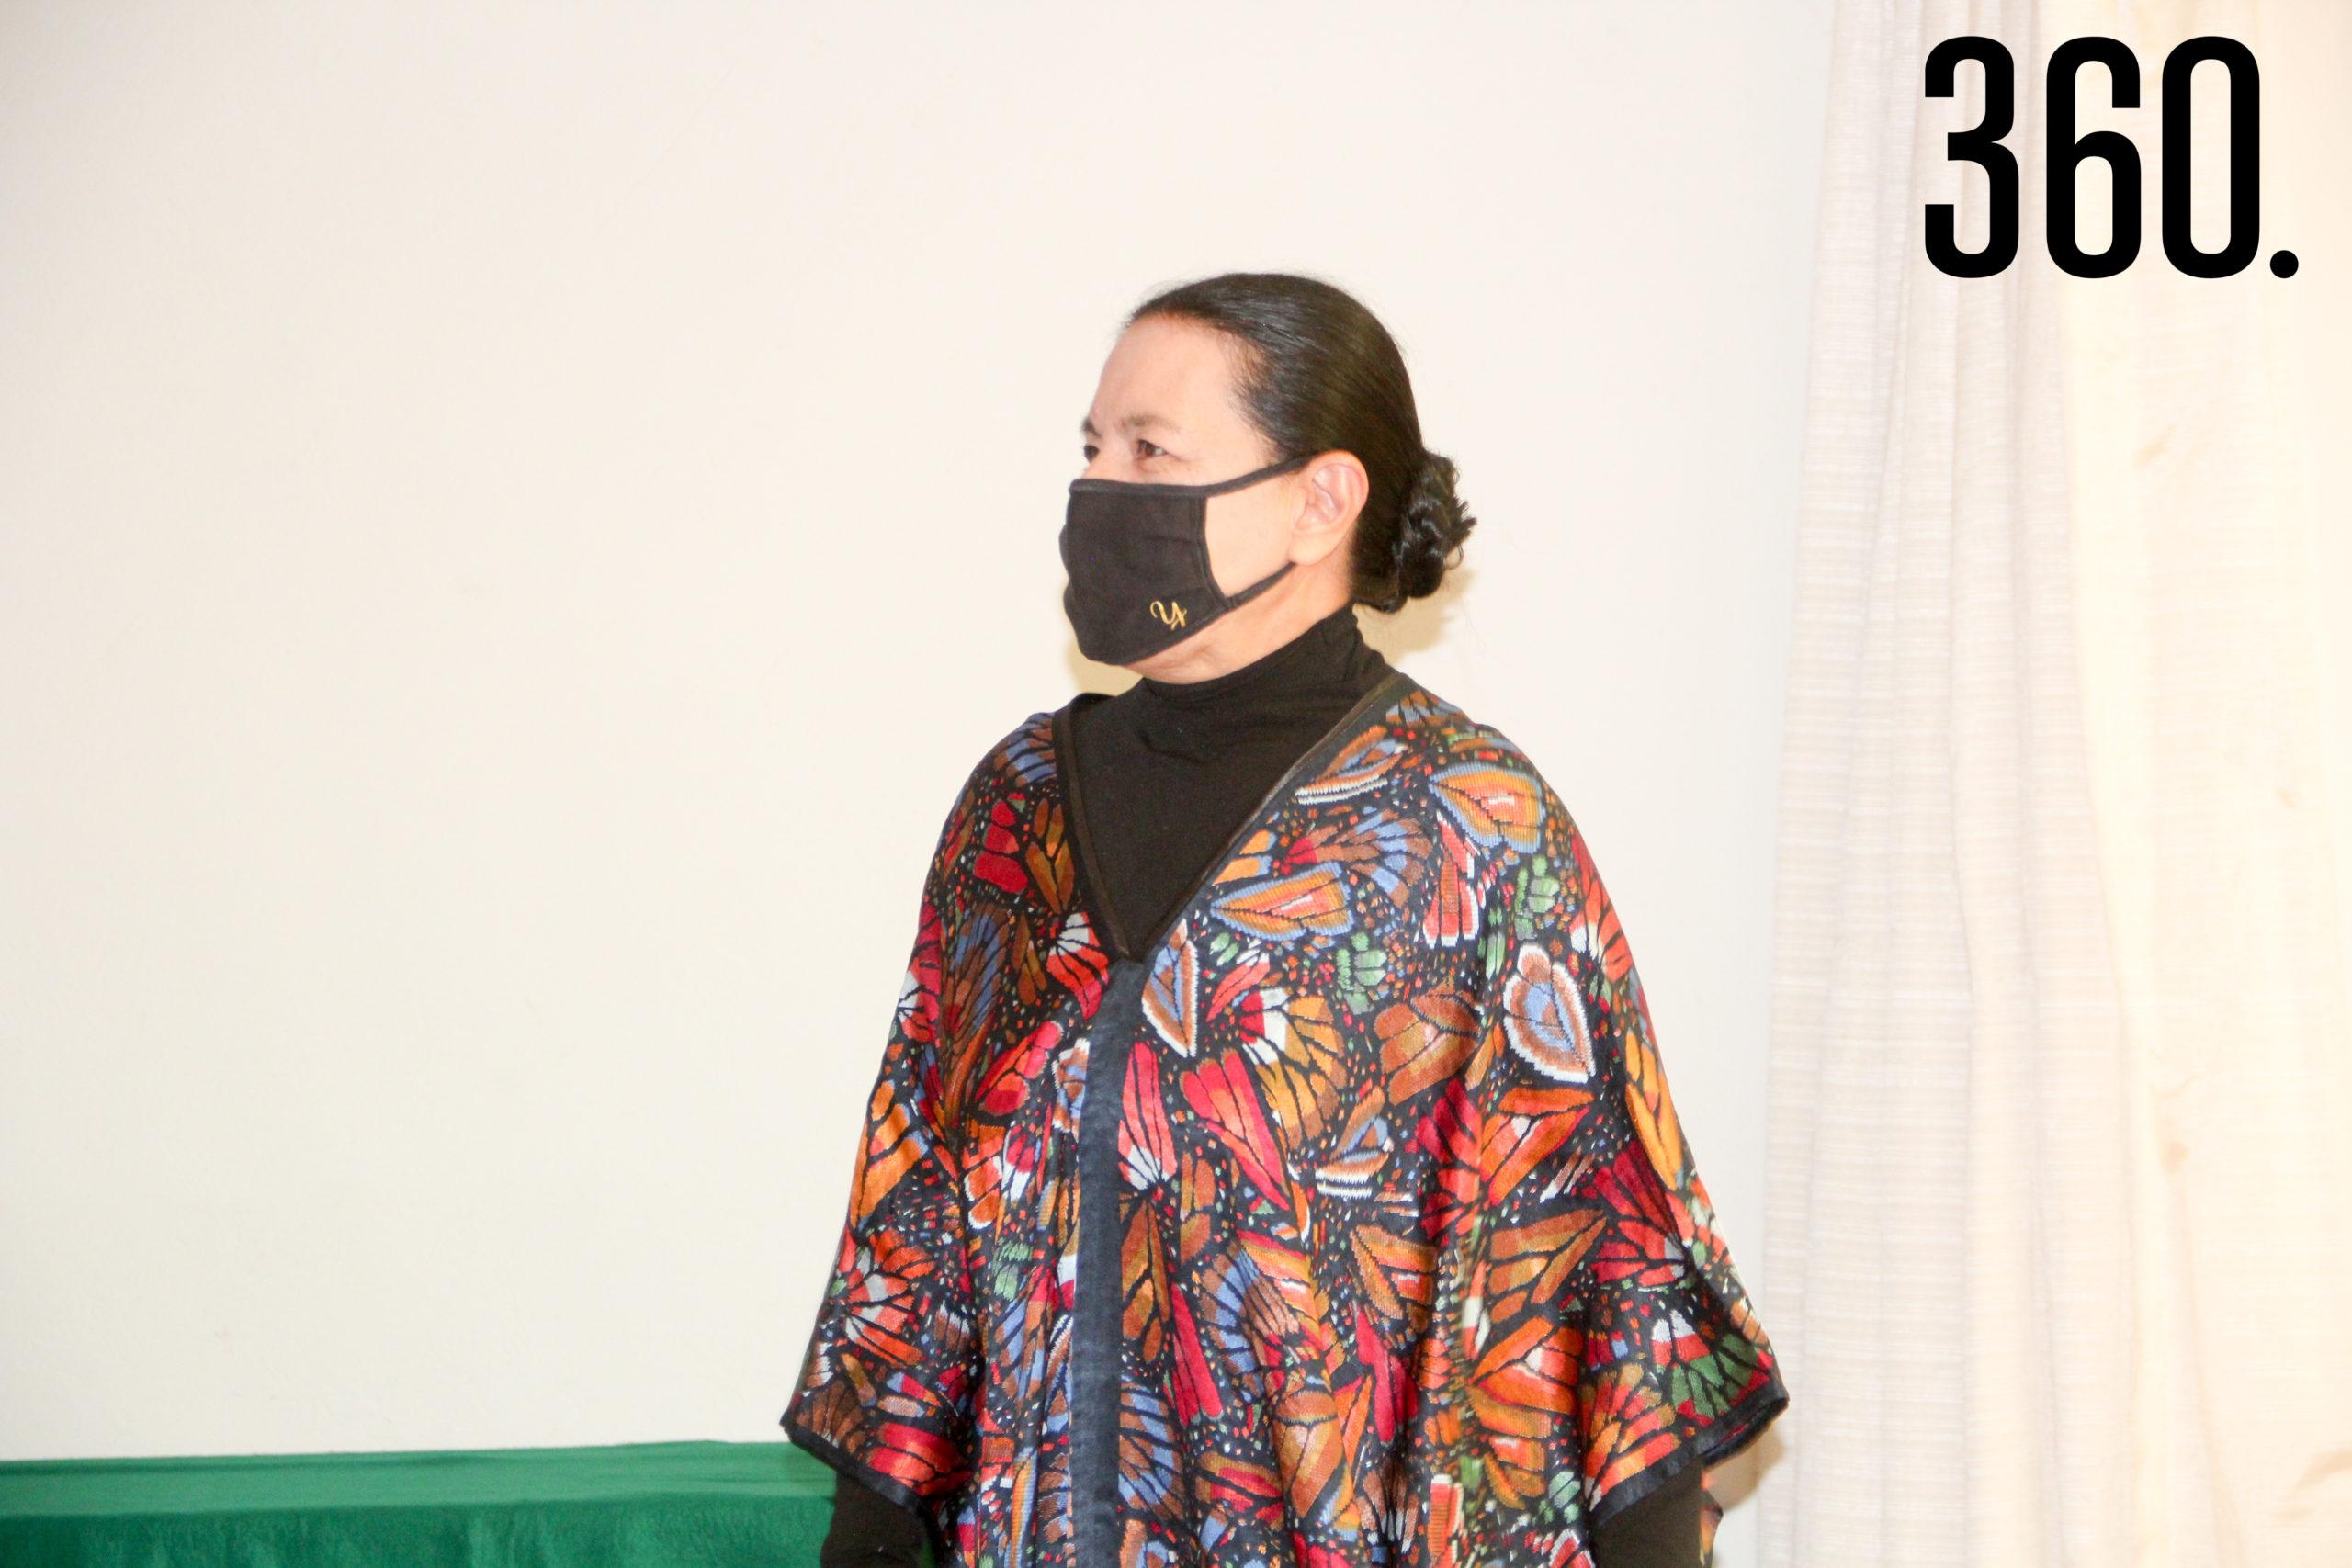 Dra. Yolanda Garza, premio anual al Profesor Distinguido.